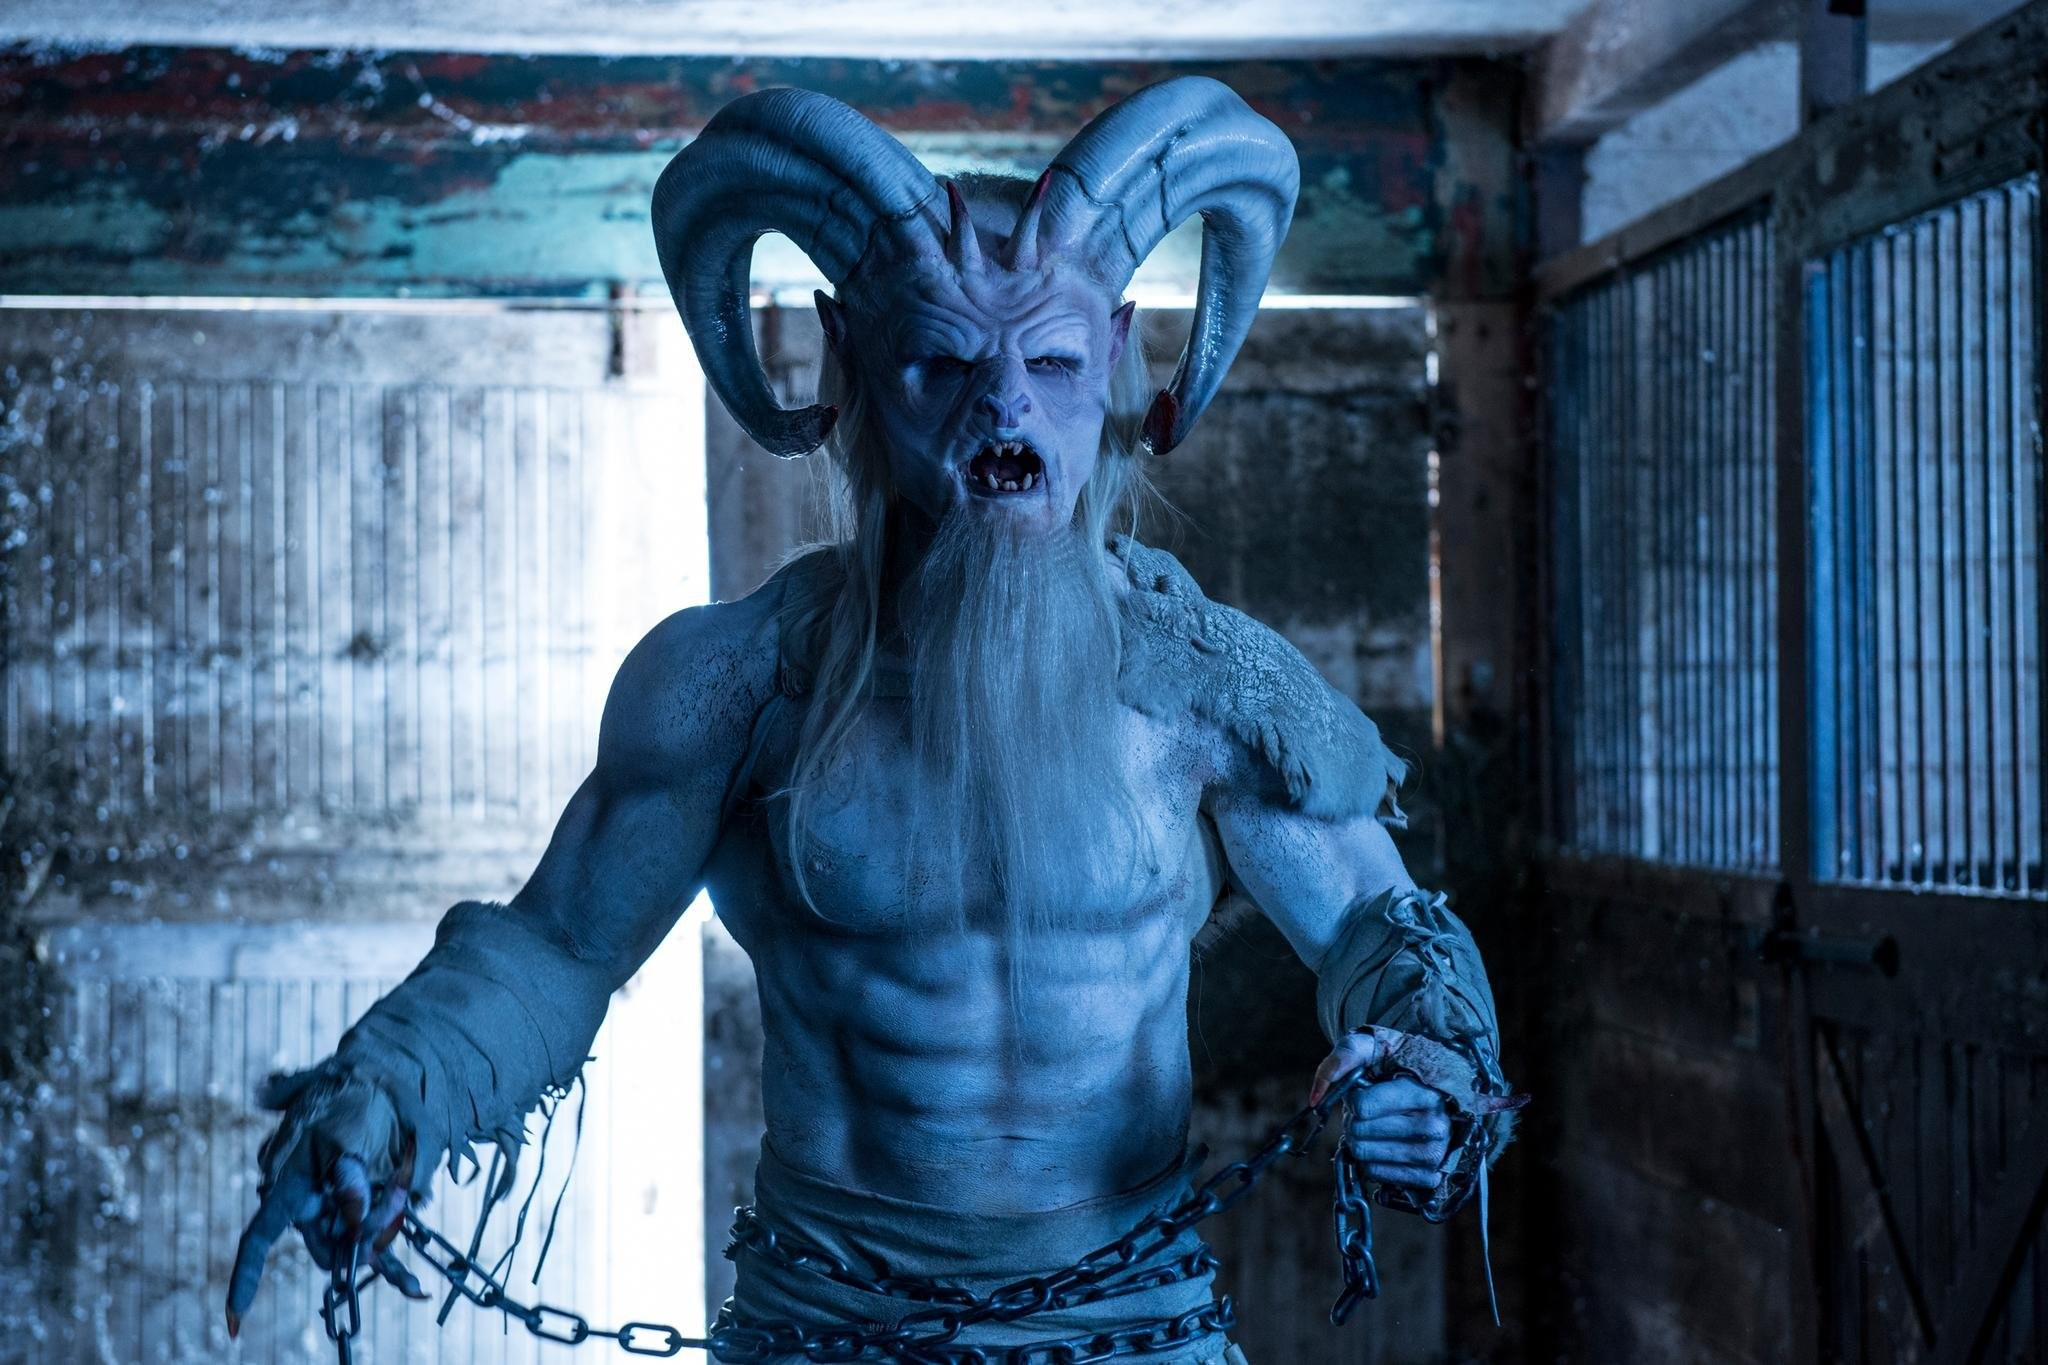 Res: 2048x1365, vector, occult, mobile, art, evil horror,tablet backgrounds, dark, story,  demon,krampus, hd vectors, monster, christmas Wallpaper HD